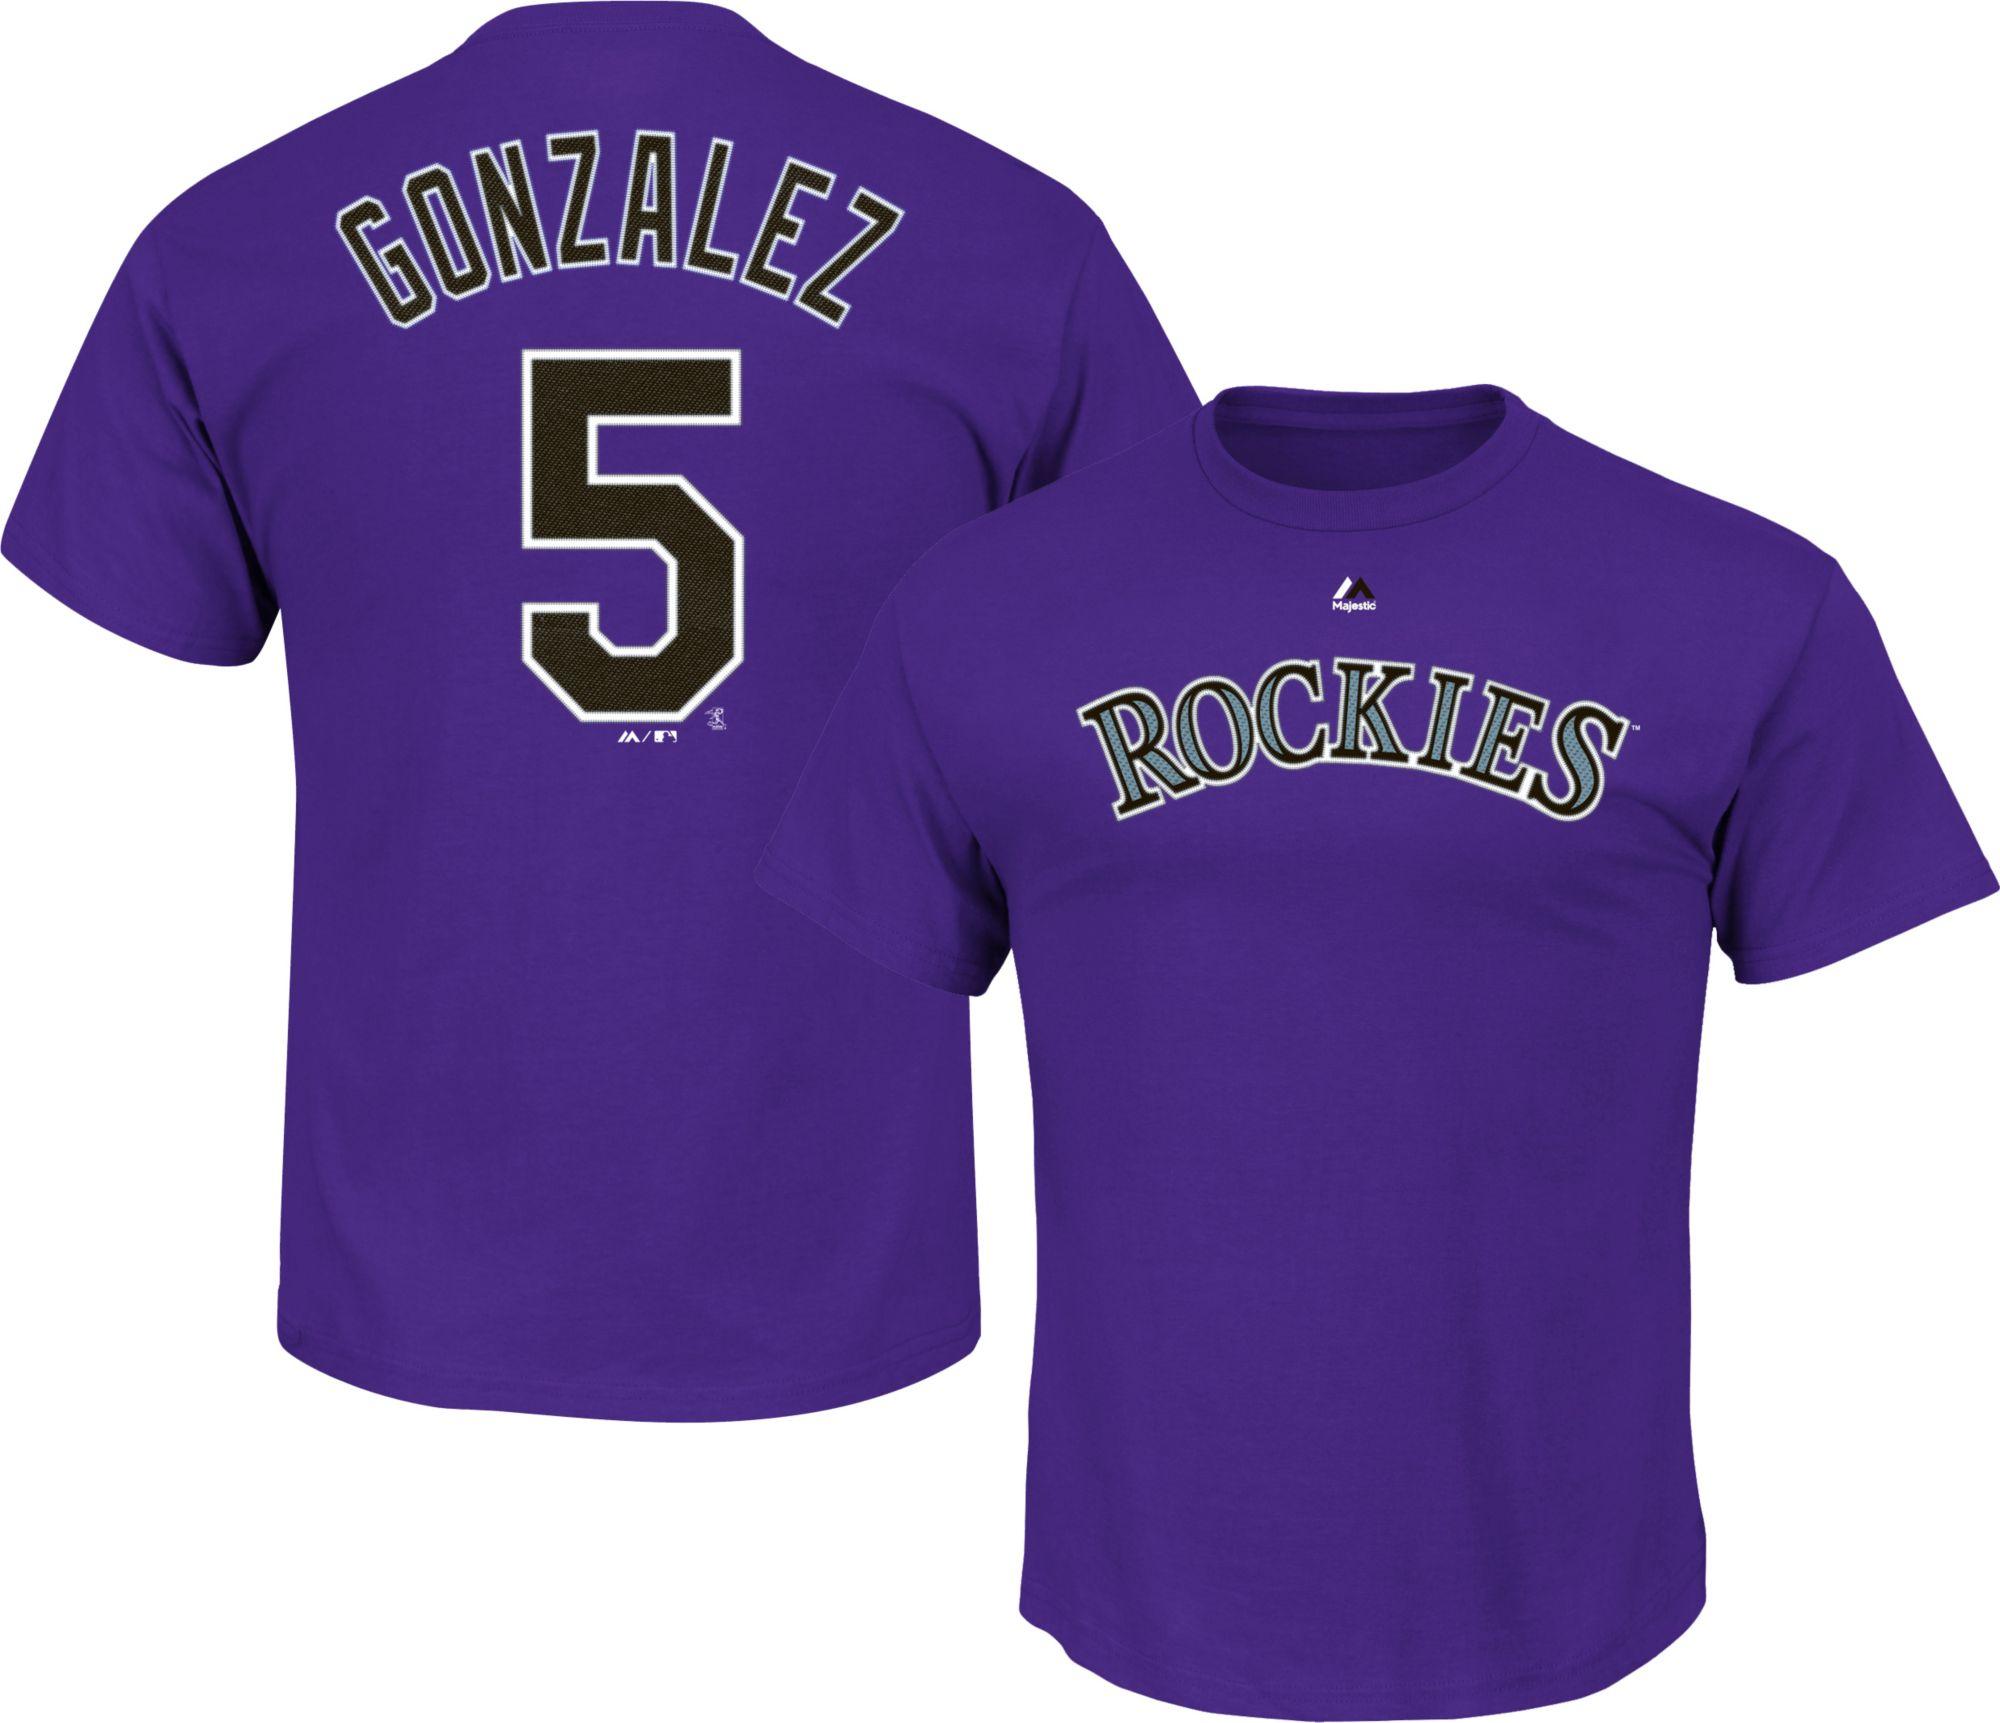 Colorado Rockies #5 Gonzalez Purple Kids Jersey